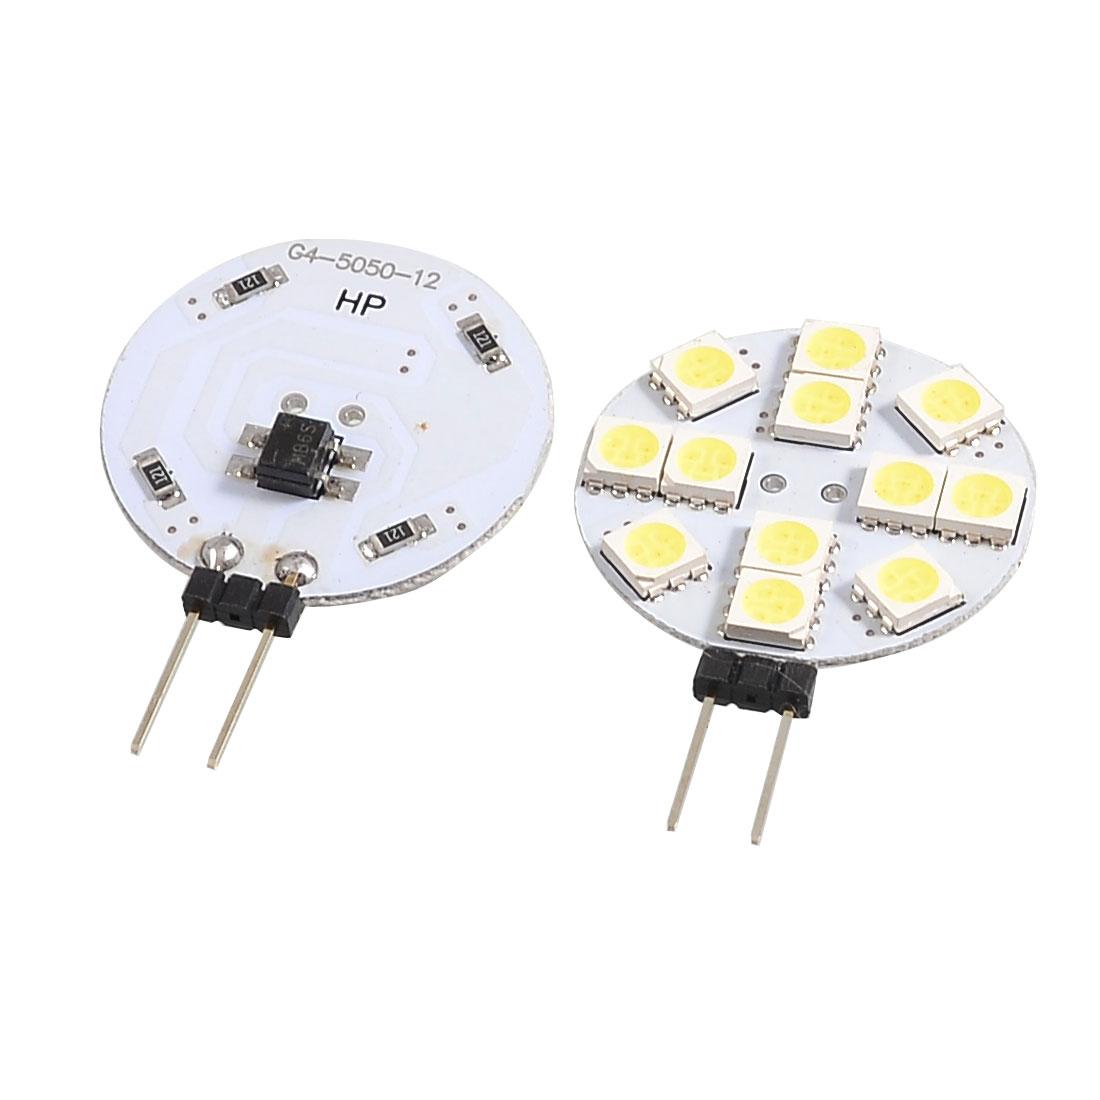 2 Pcs White G4 5050 SMD 12 LED Car Side Pin Light Bulb Lamp DC 12V internal